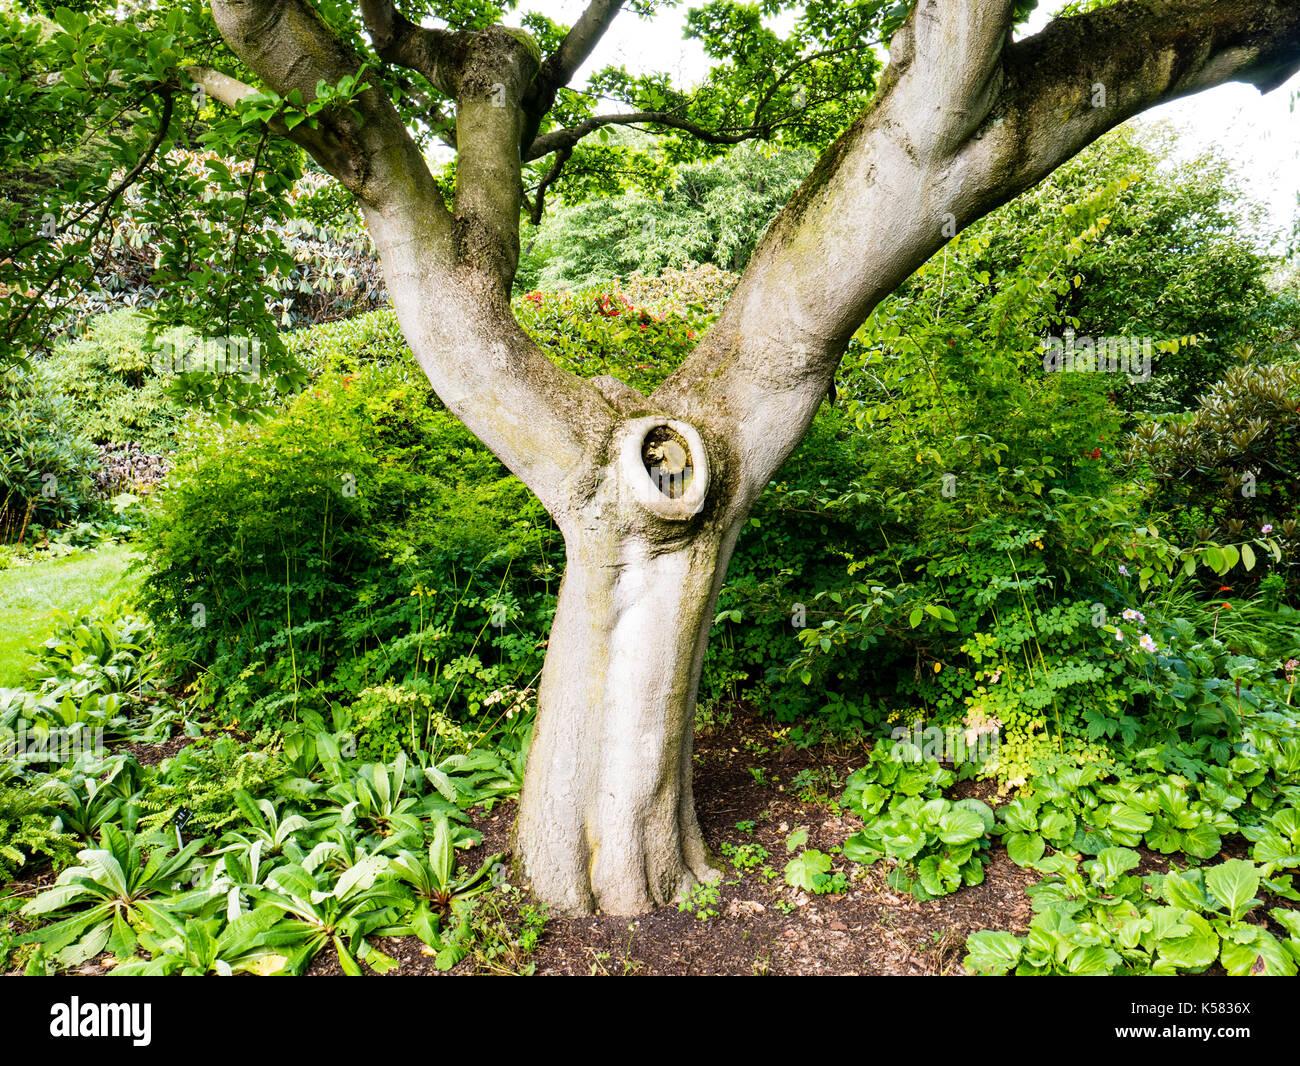 Tree royal botanic gardens stock photos tree royal for Garden trees scotland